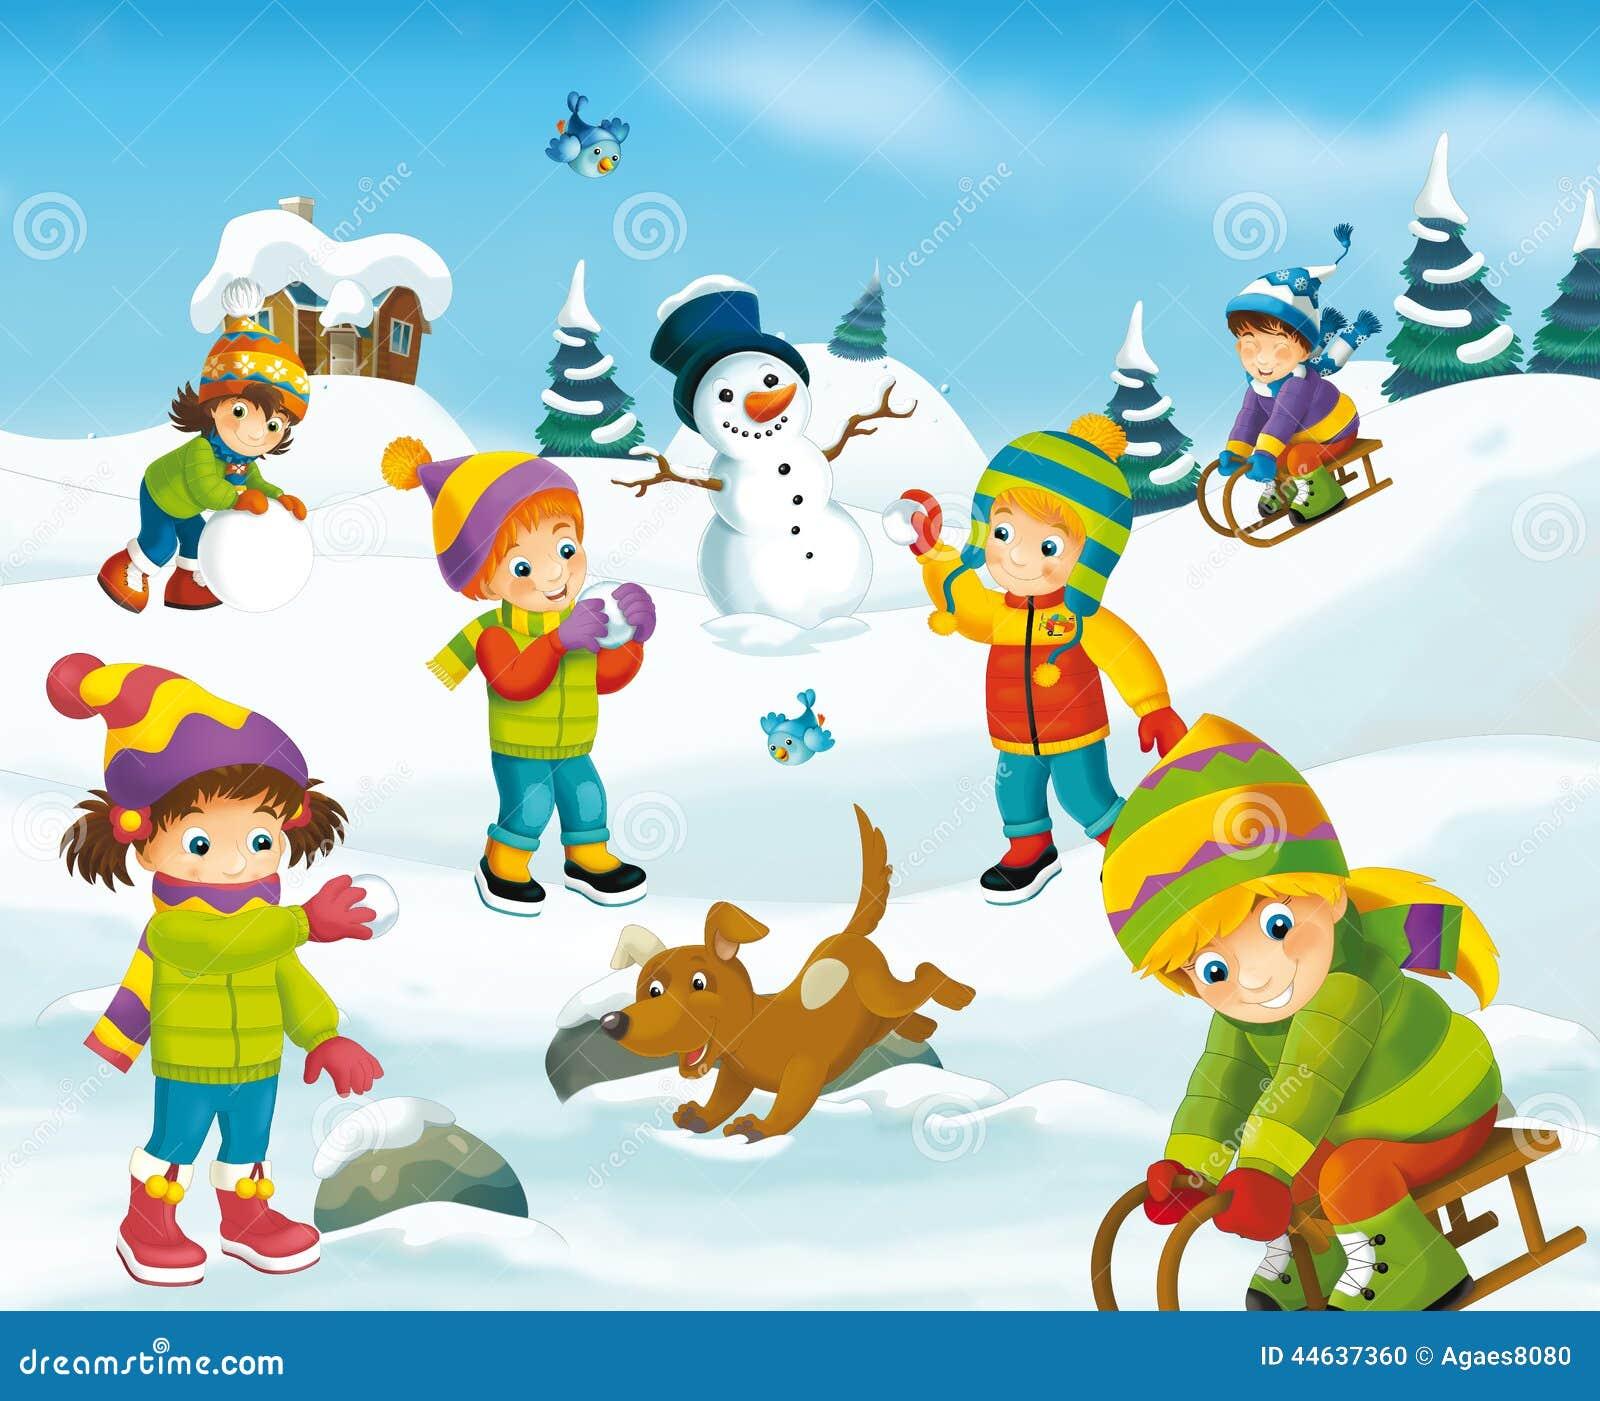 Outside Christmas Games For Kids